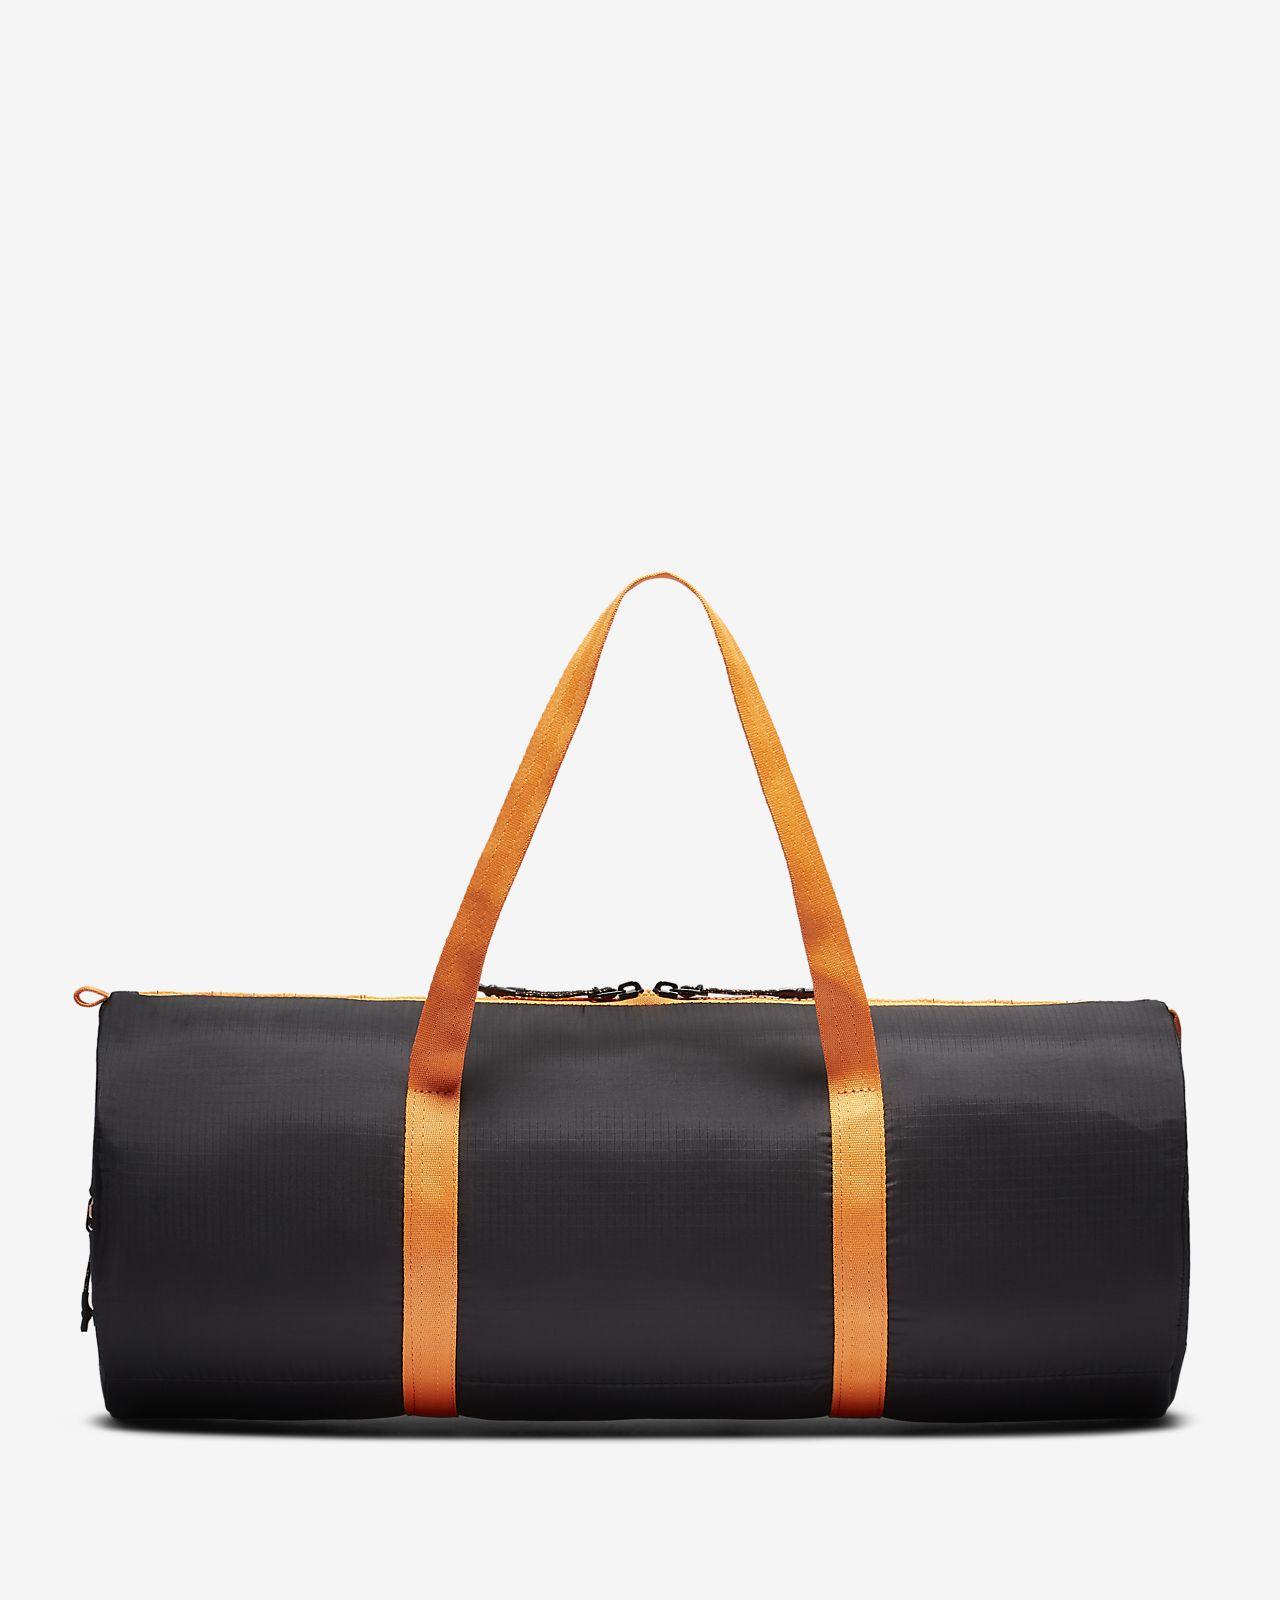 439e3c2d1fe6 Nike ACG Packable Duffel Bag. Nike.com CA